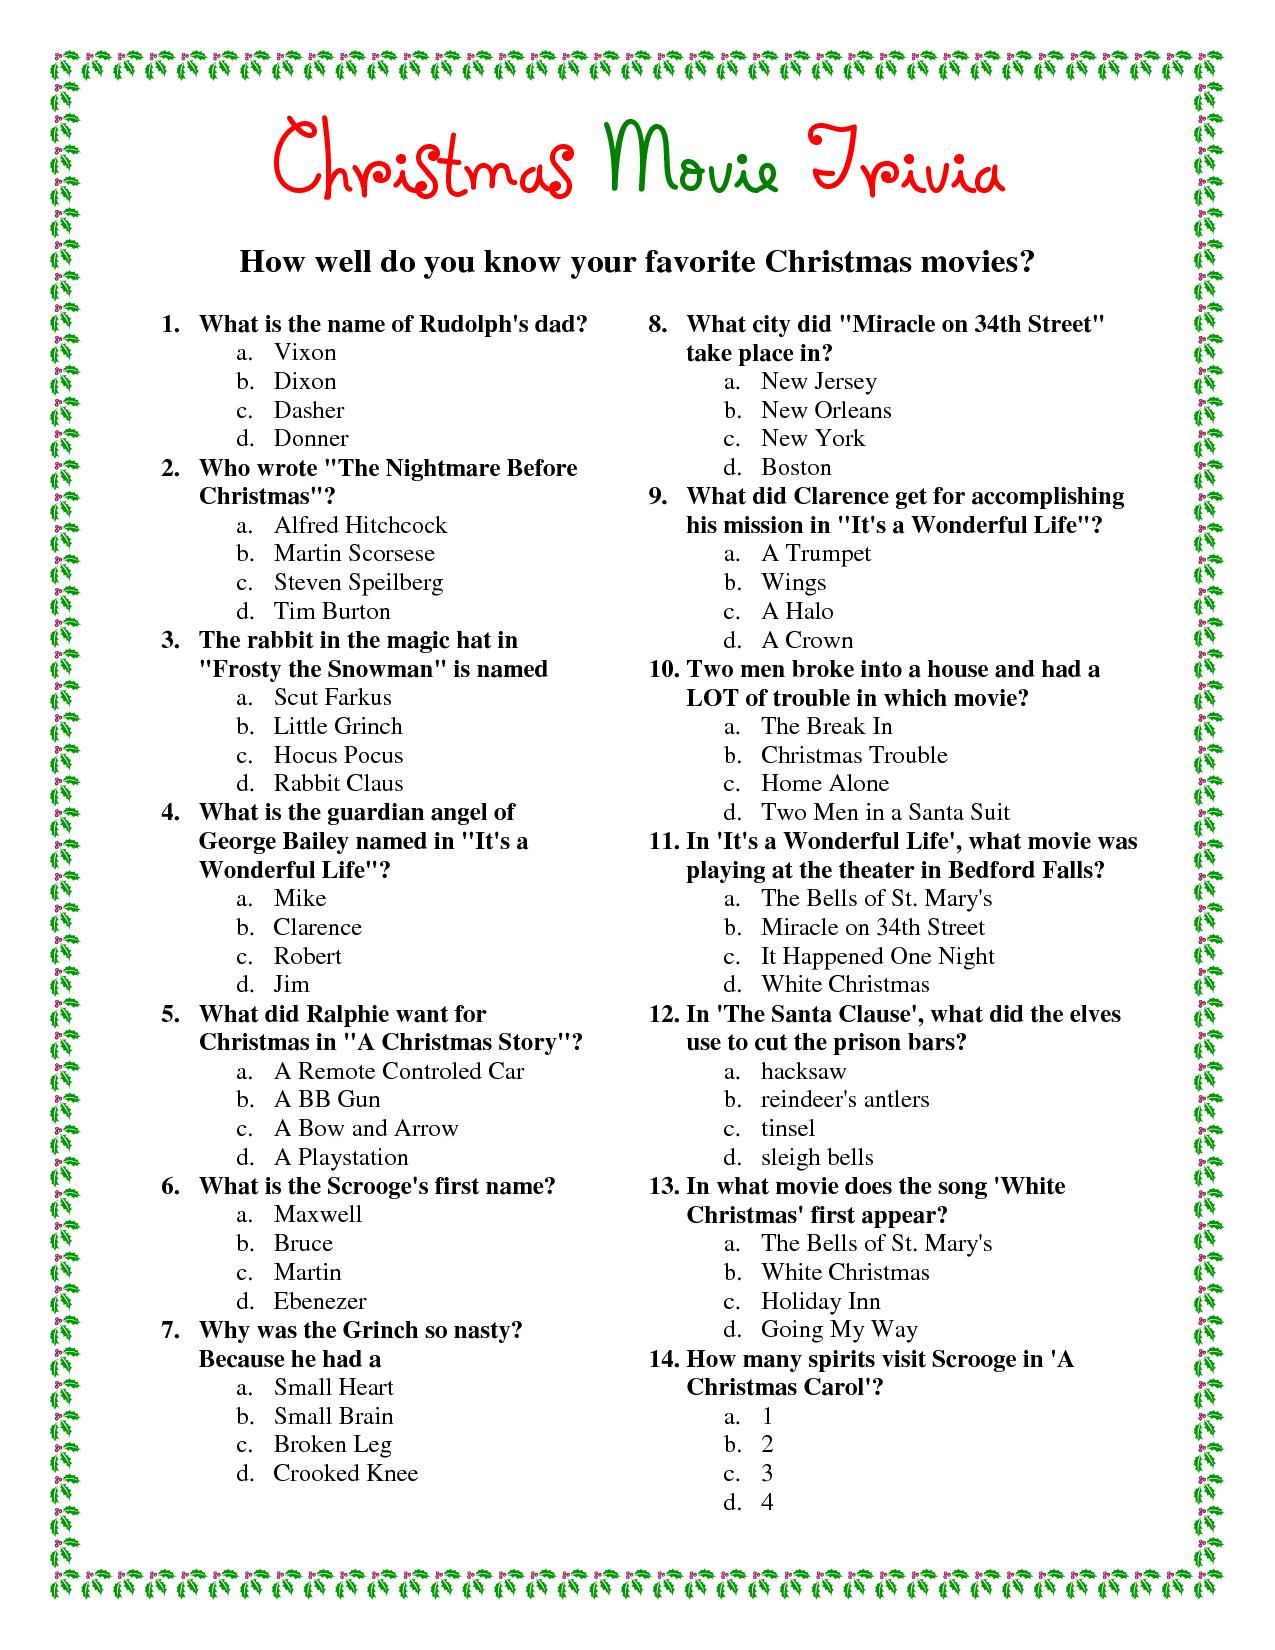 Printable Christmas Movie Trivia.pdf Download Legal Documents - Free Printable Christmas Song Quiz